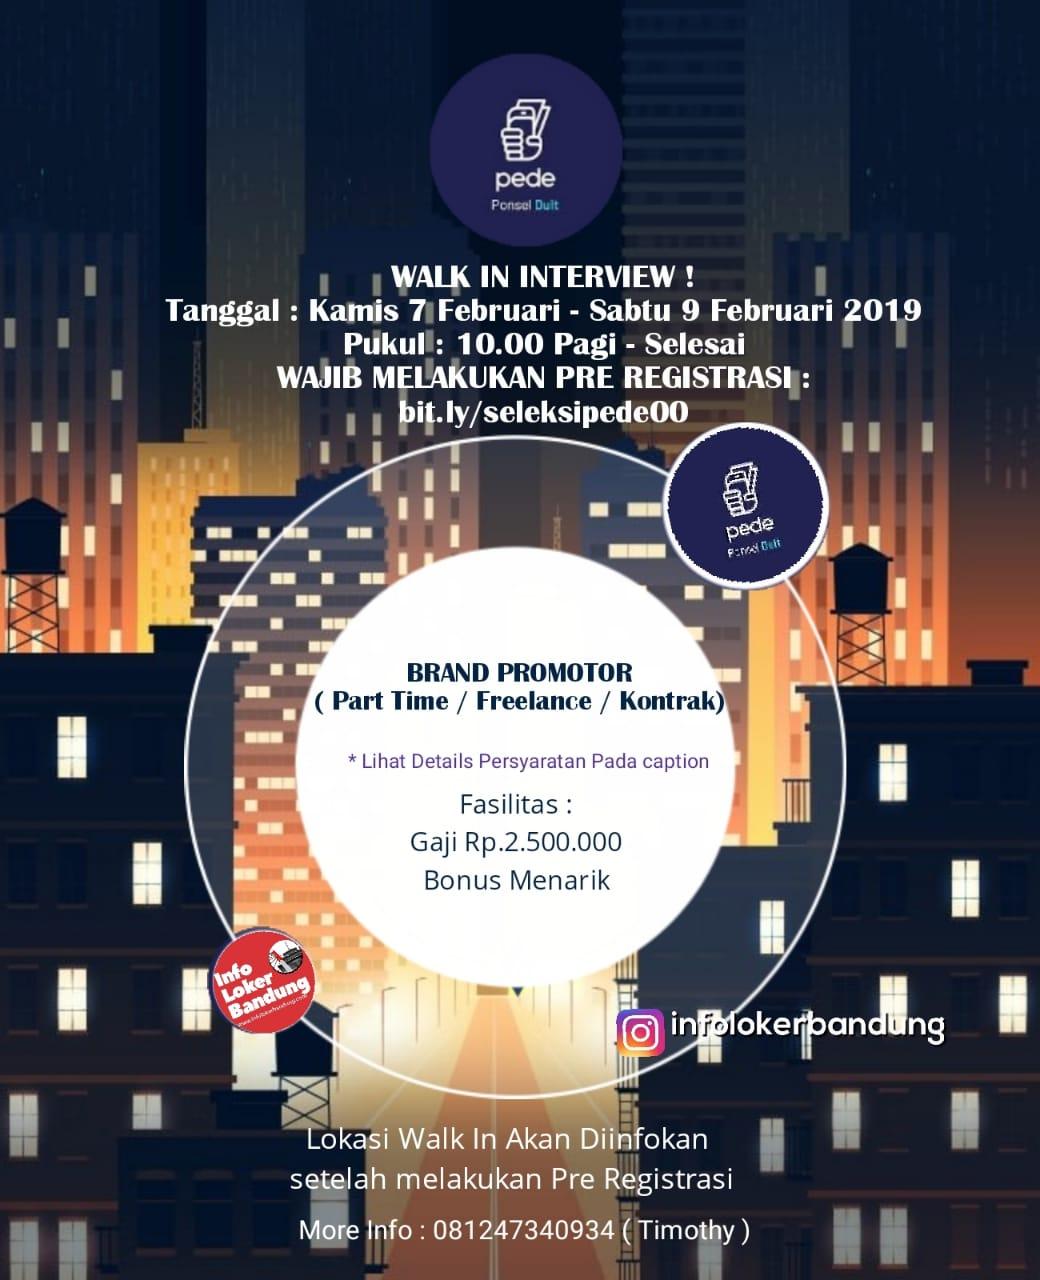 Walk In Interview Ponsel Duit ( Pede ) Bandung 7 -  9 Februari 2019